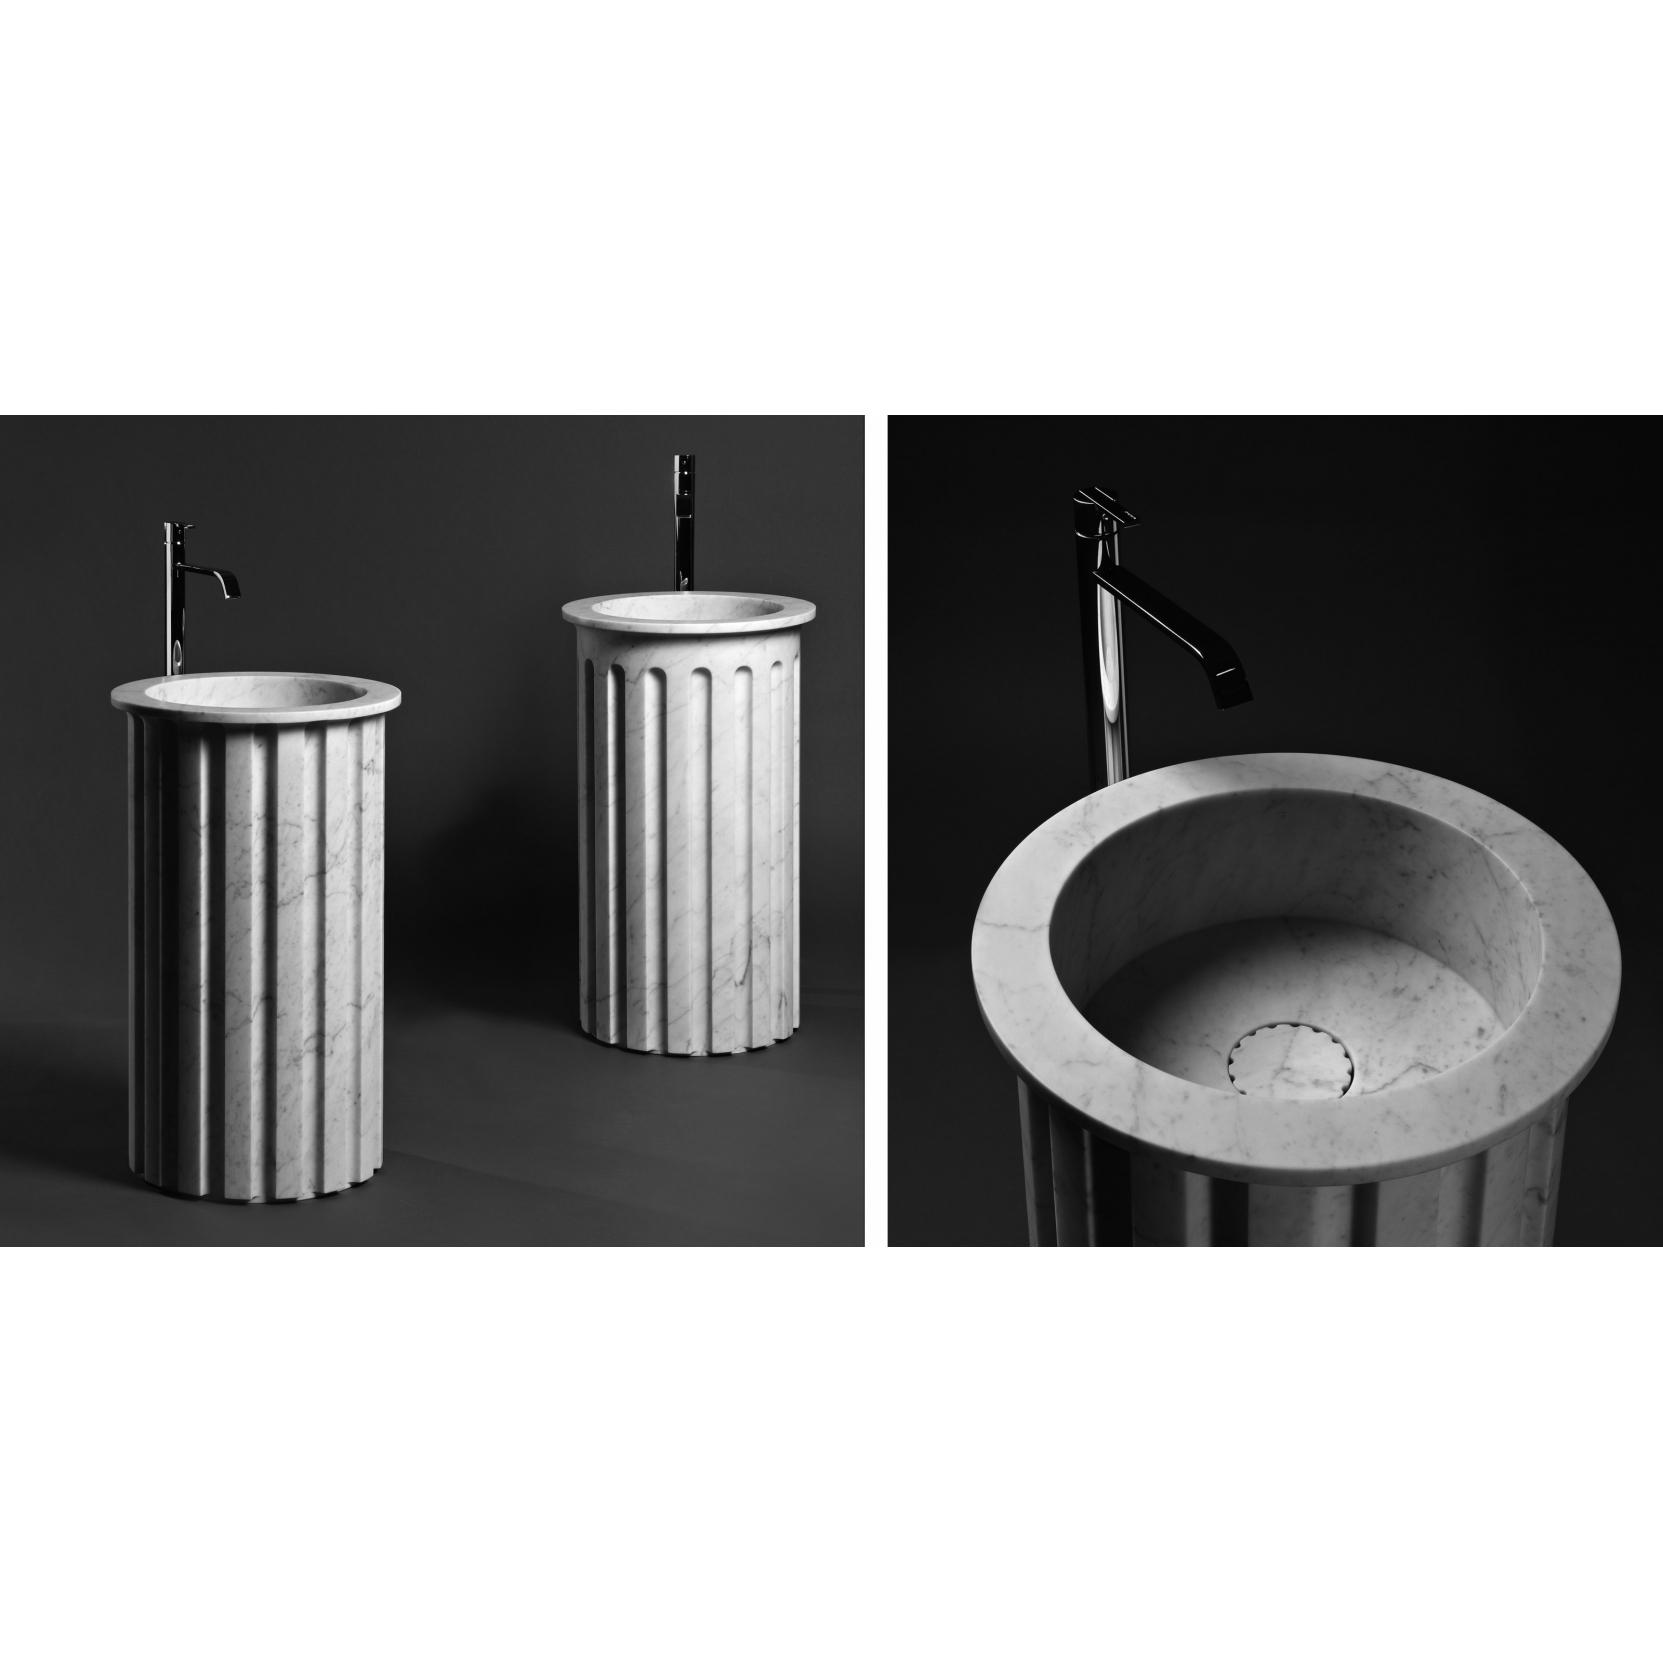 Antonio lupi atlante lavabo freestanding tattahome for Nerbi arredamento